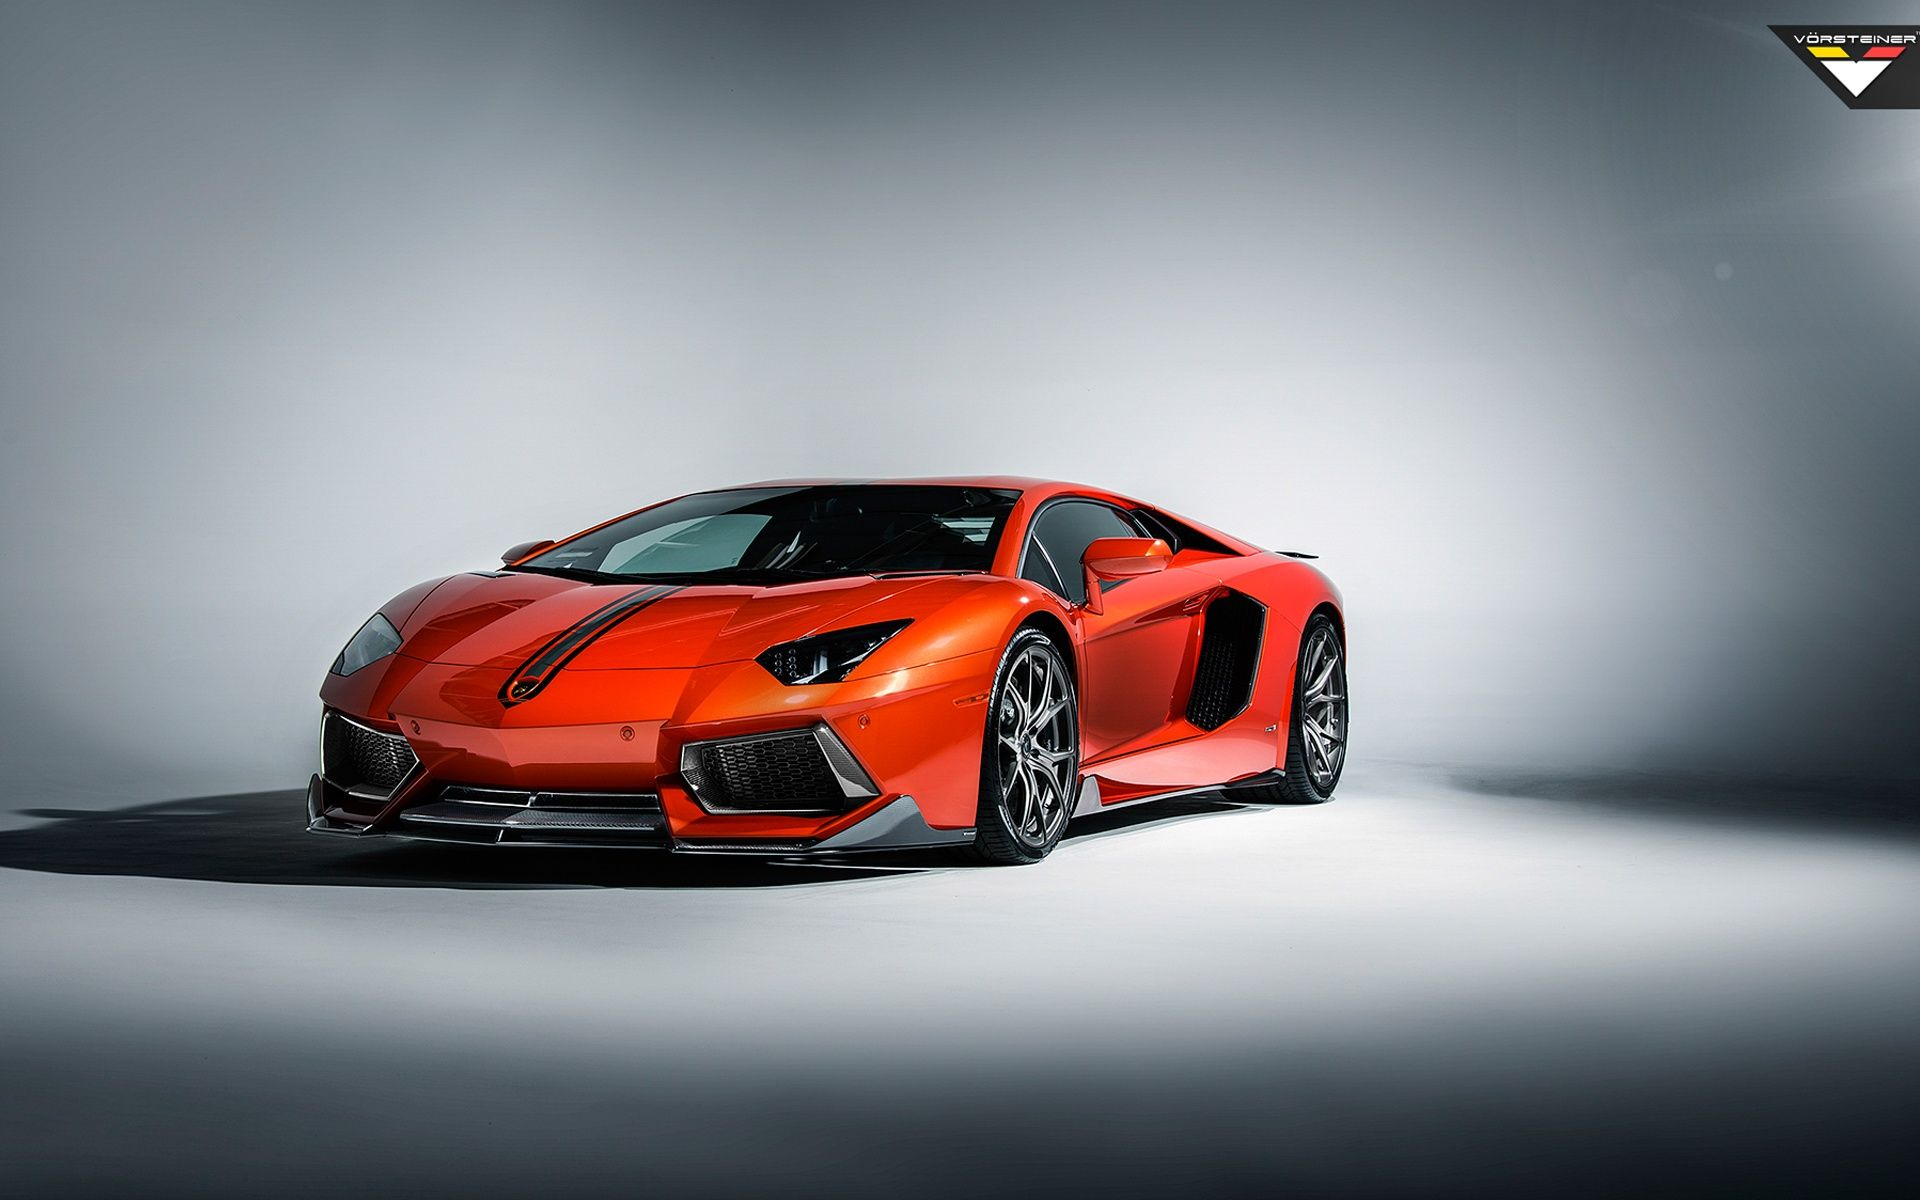 Lamborghini Wallpaper Phone